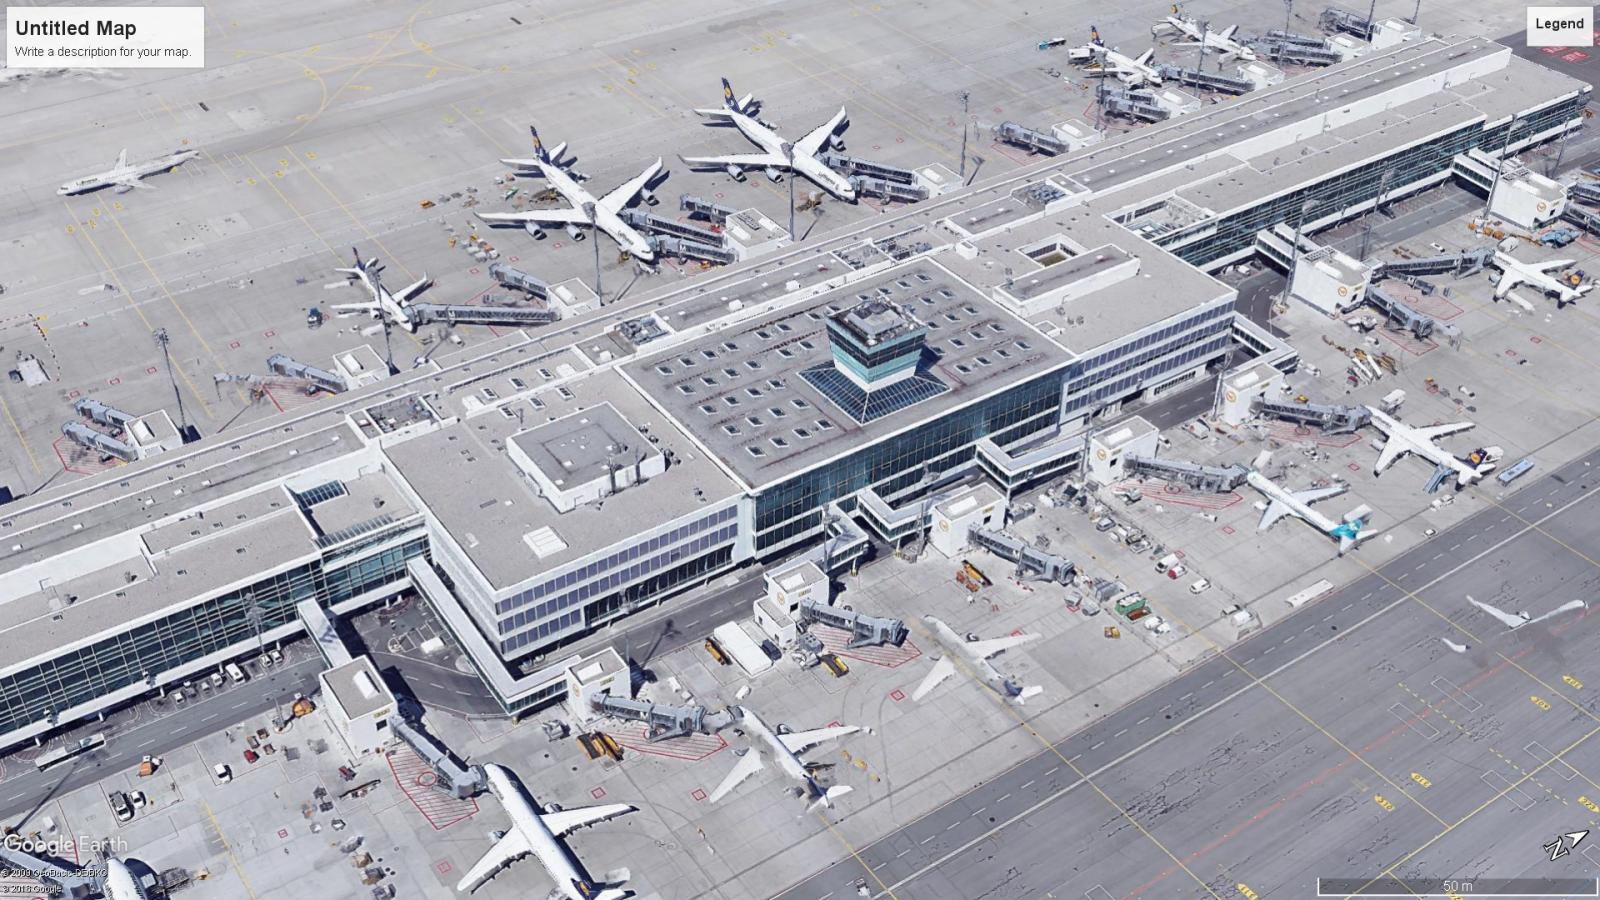 Scenery Gateway (Lego Bricks) default airports (global